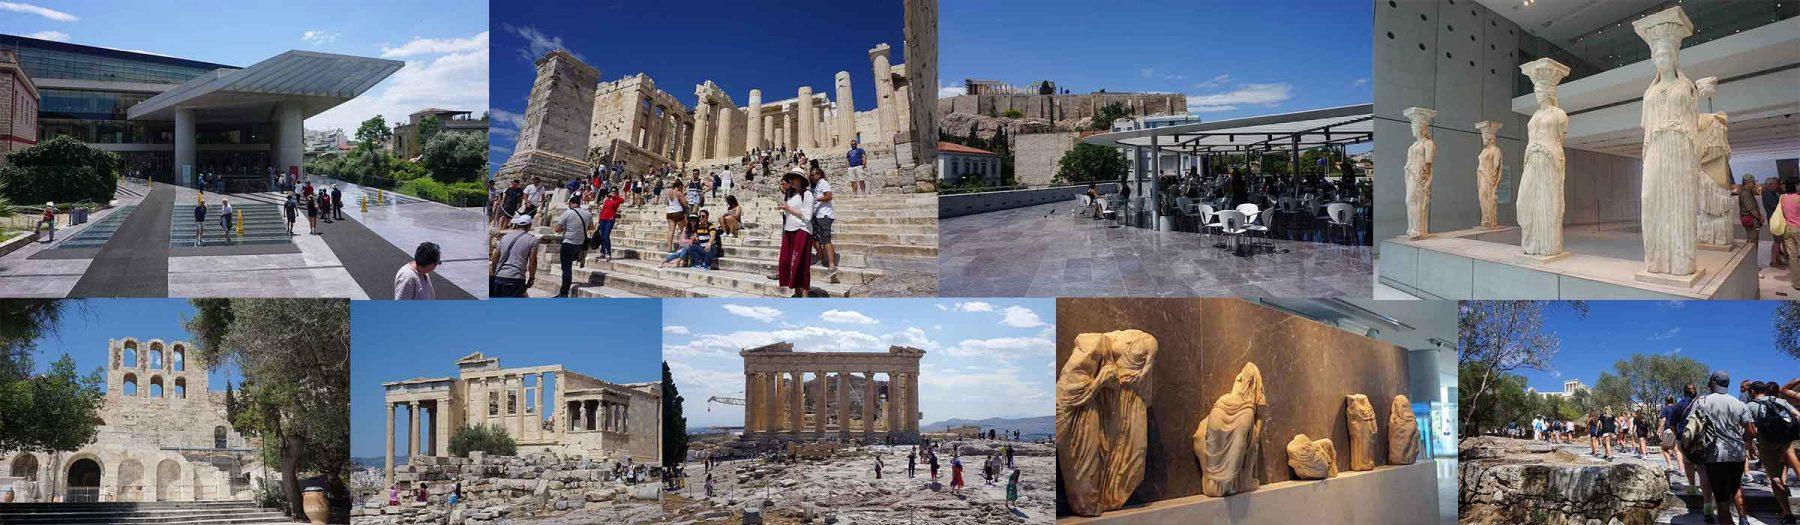 acropolispostbannerweb